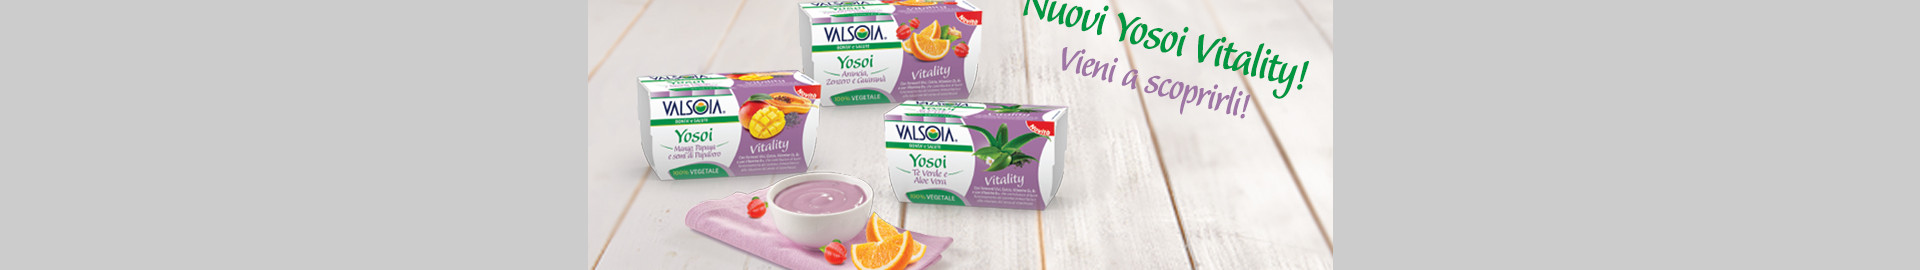 Yosoi Vitality: la nuova alternativa vegetale Valsoia allo yogurt